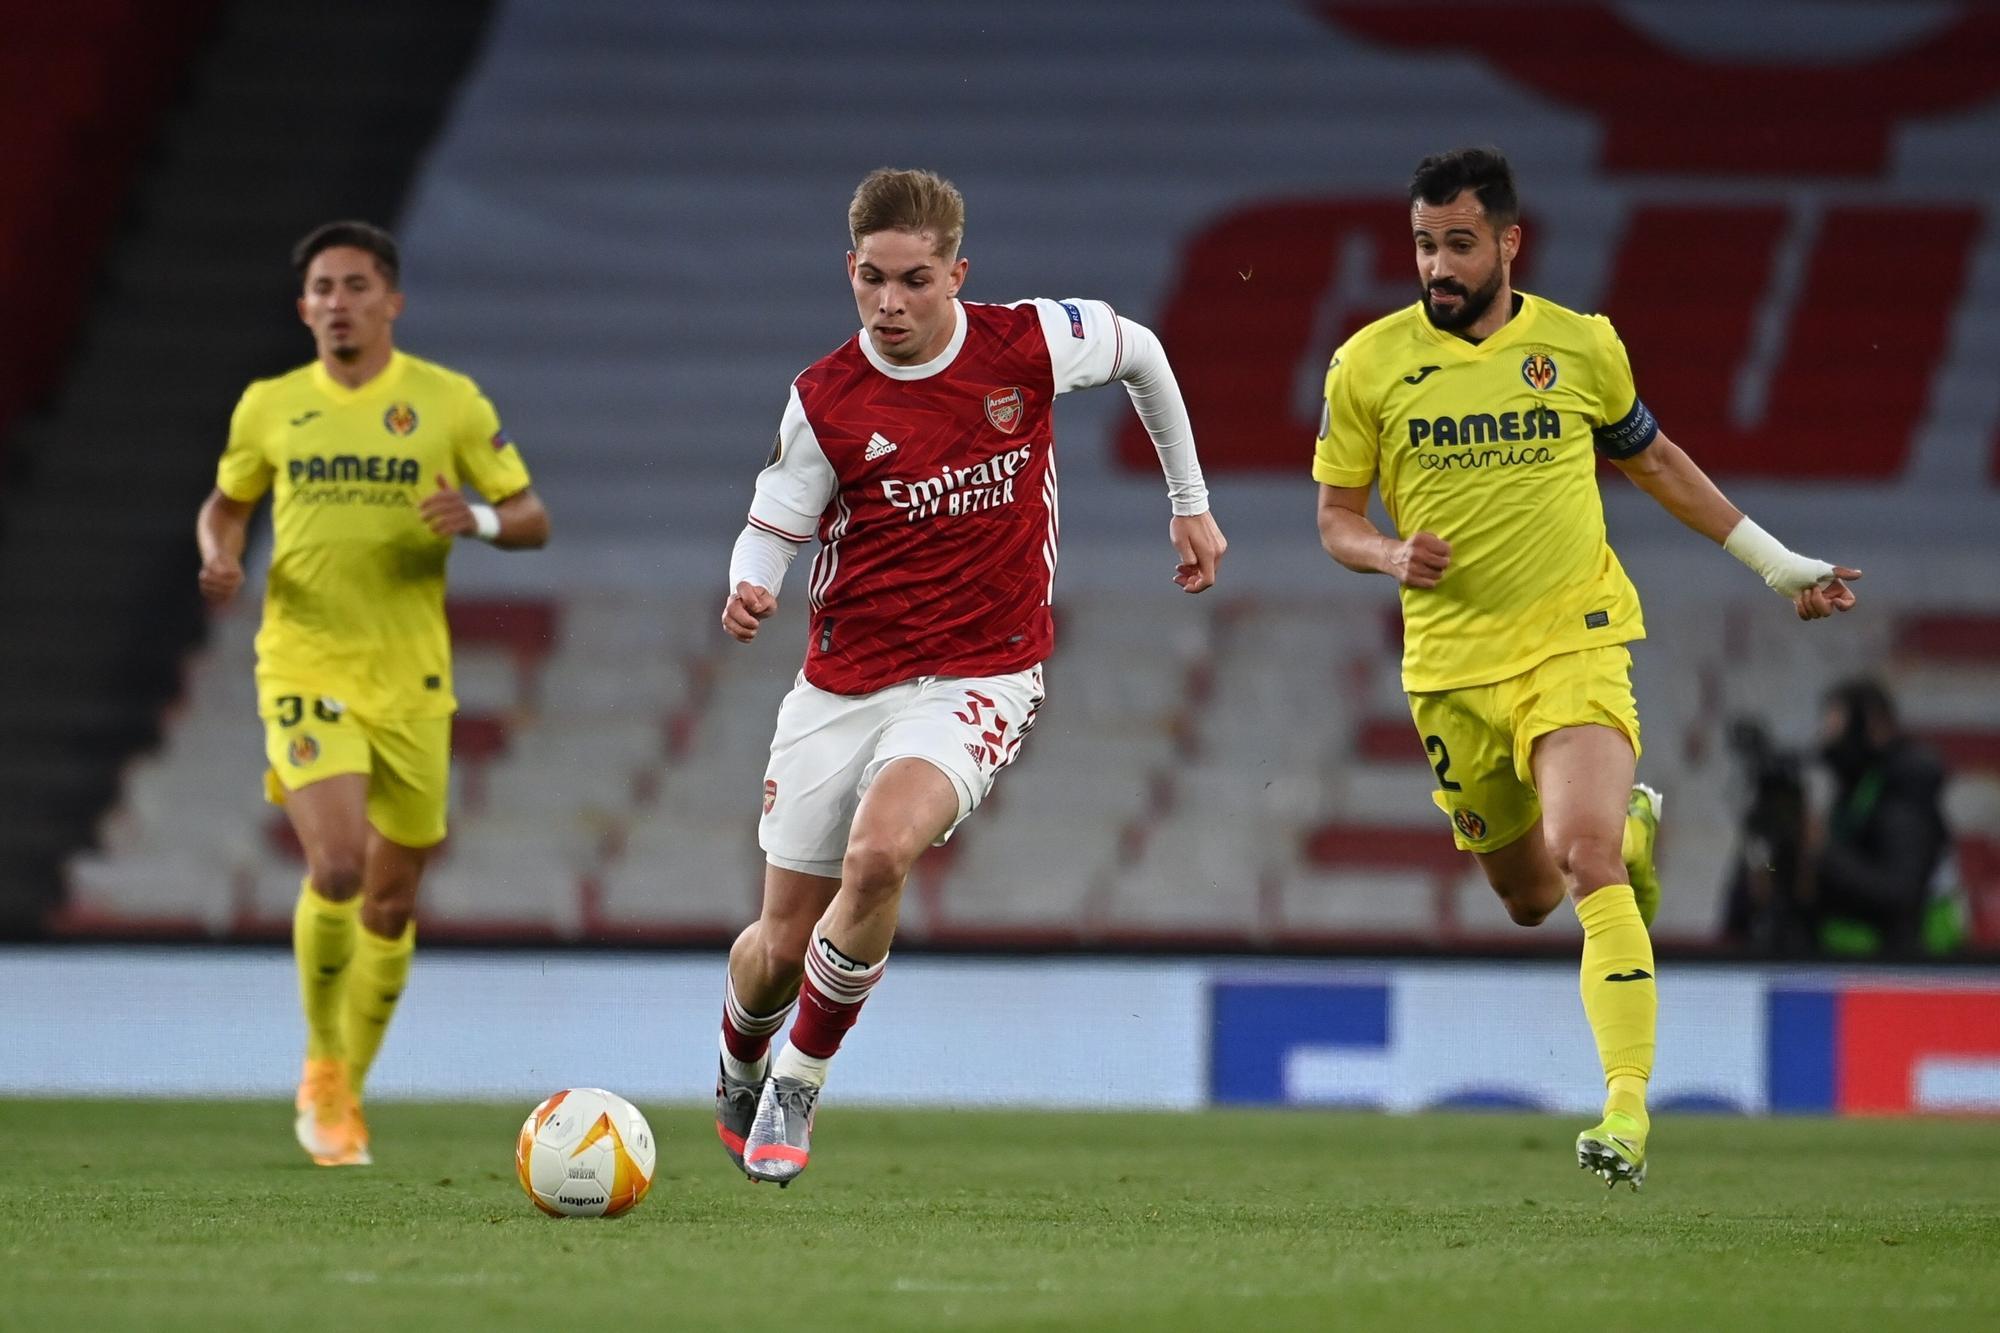 Europa League: Arsenal - Villarreal